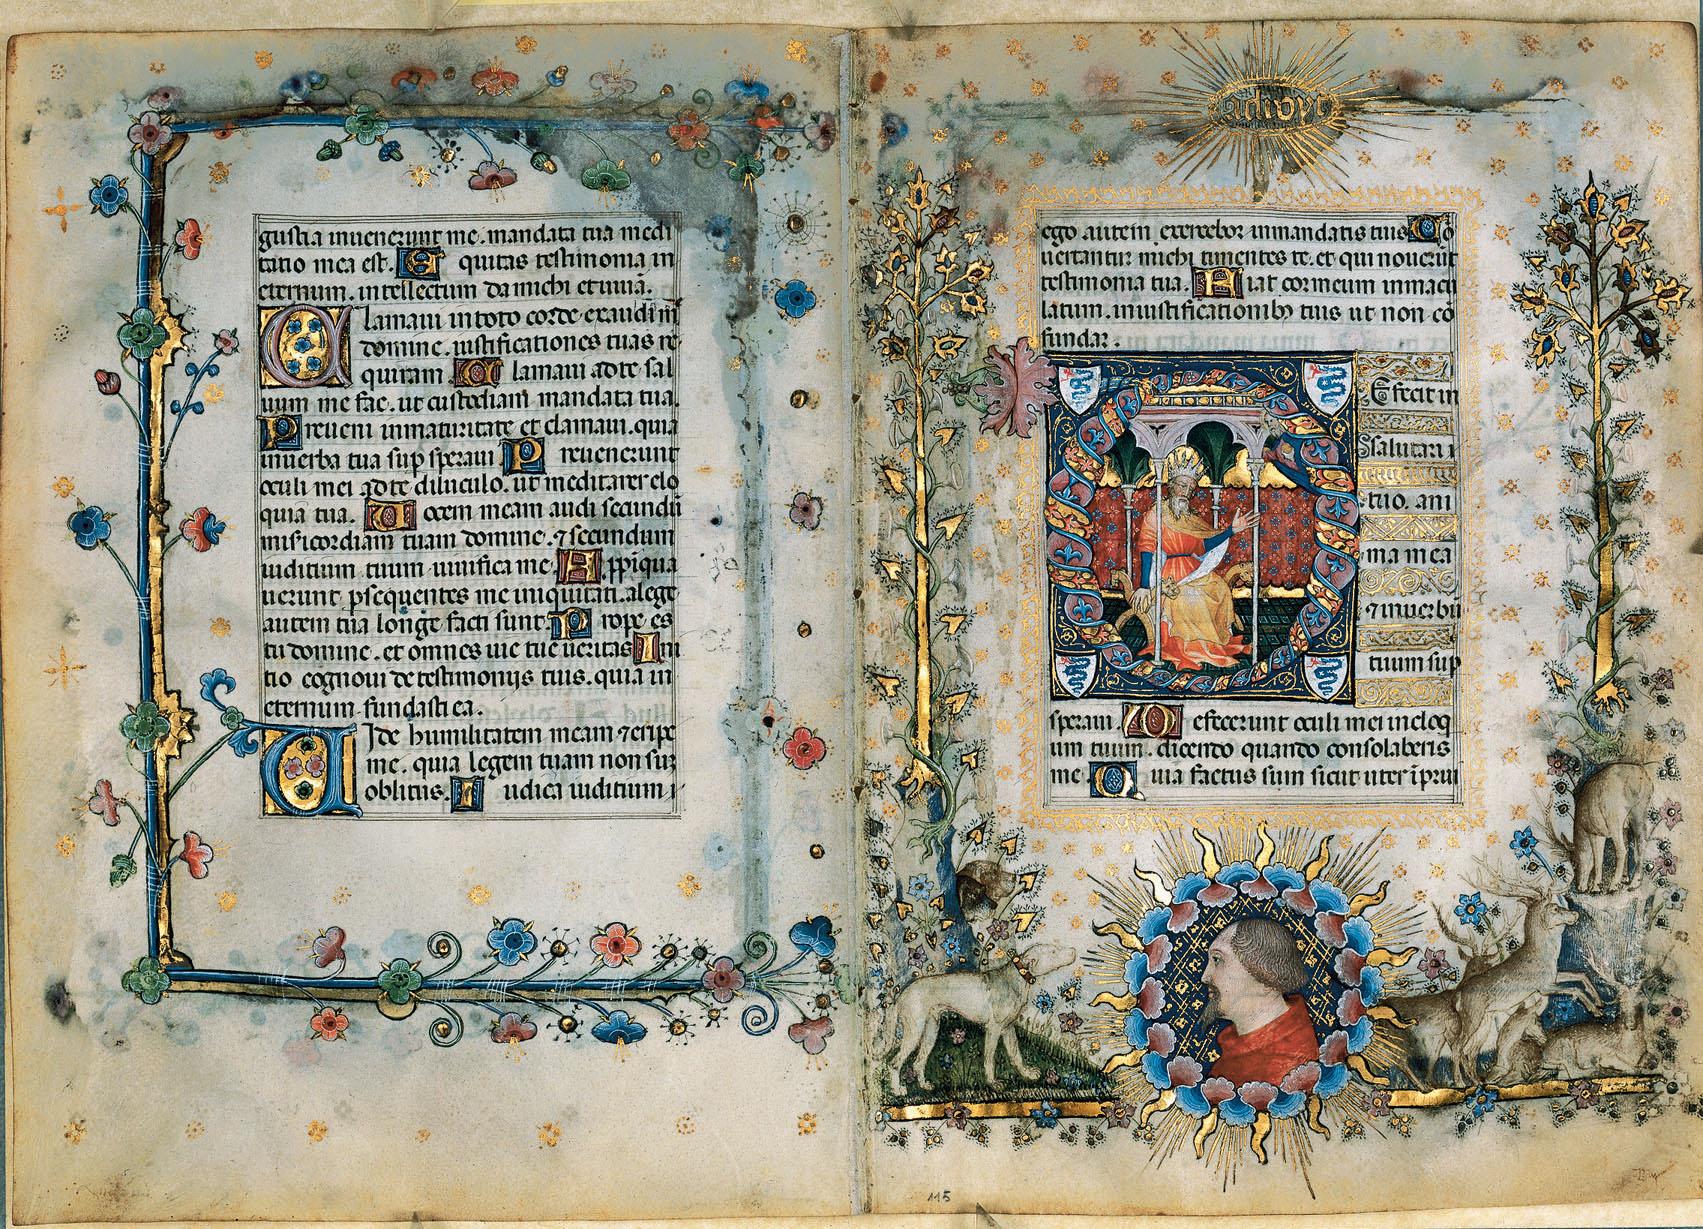 Giovanni-dei-Grassi-Hours-of-Giangaleazzo-Visconti-1395-Tempera-and-gold-on-parchment